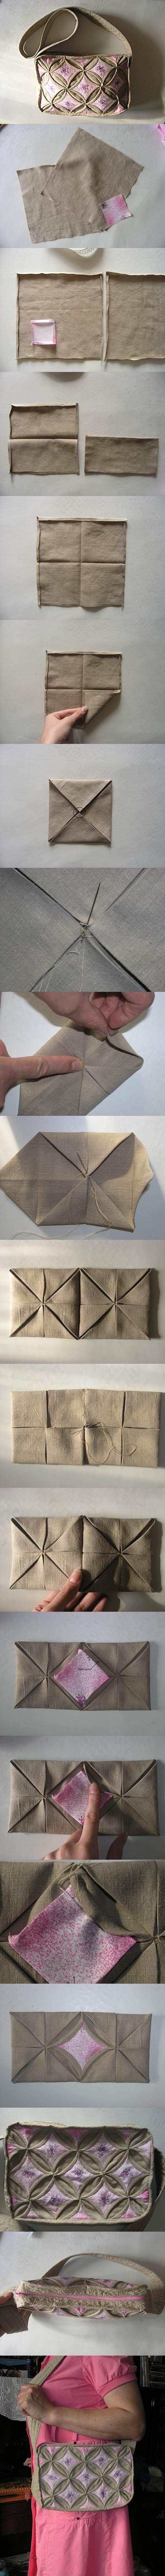 DIY Origami Style Handbag